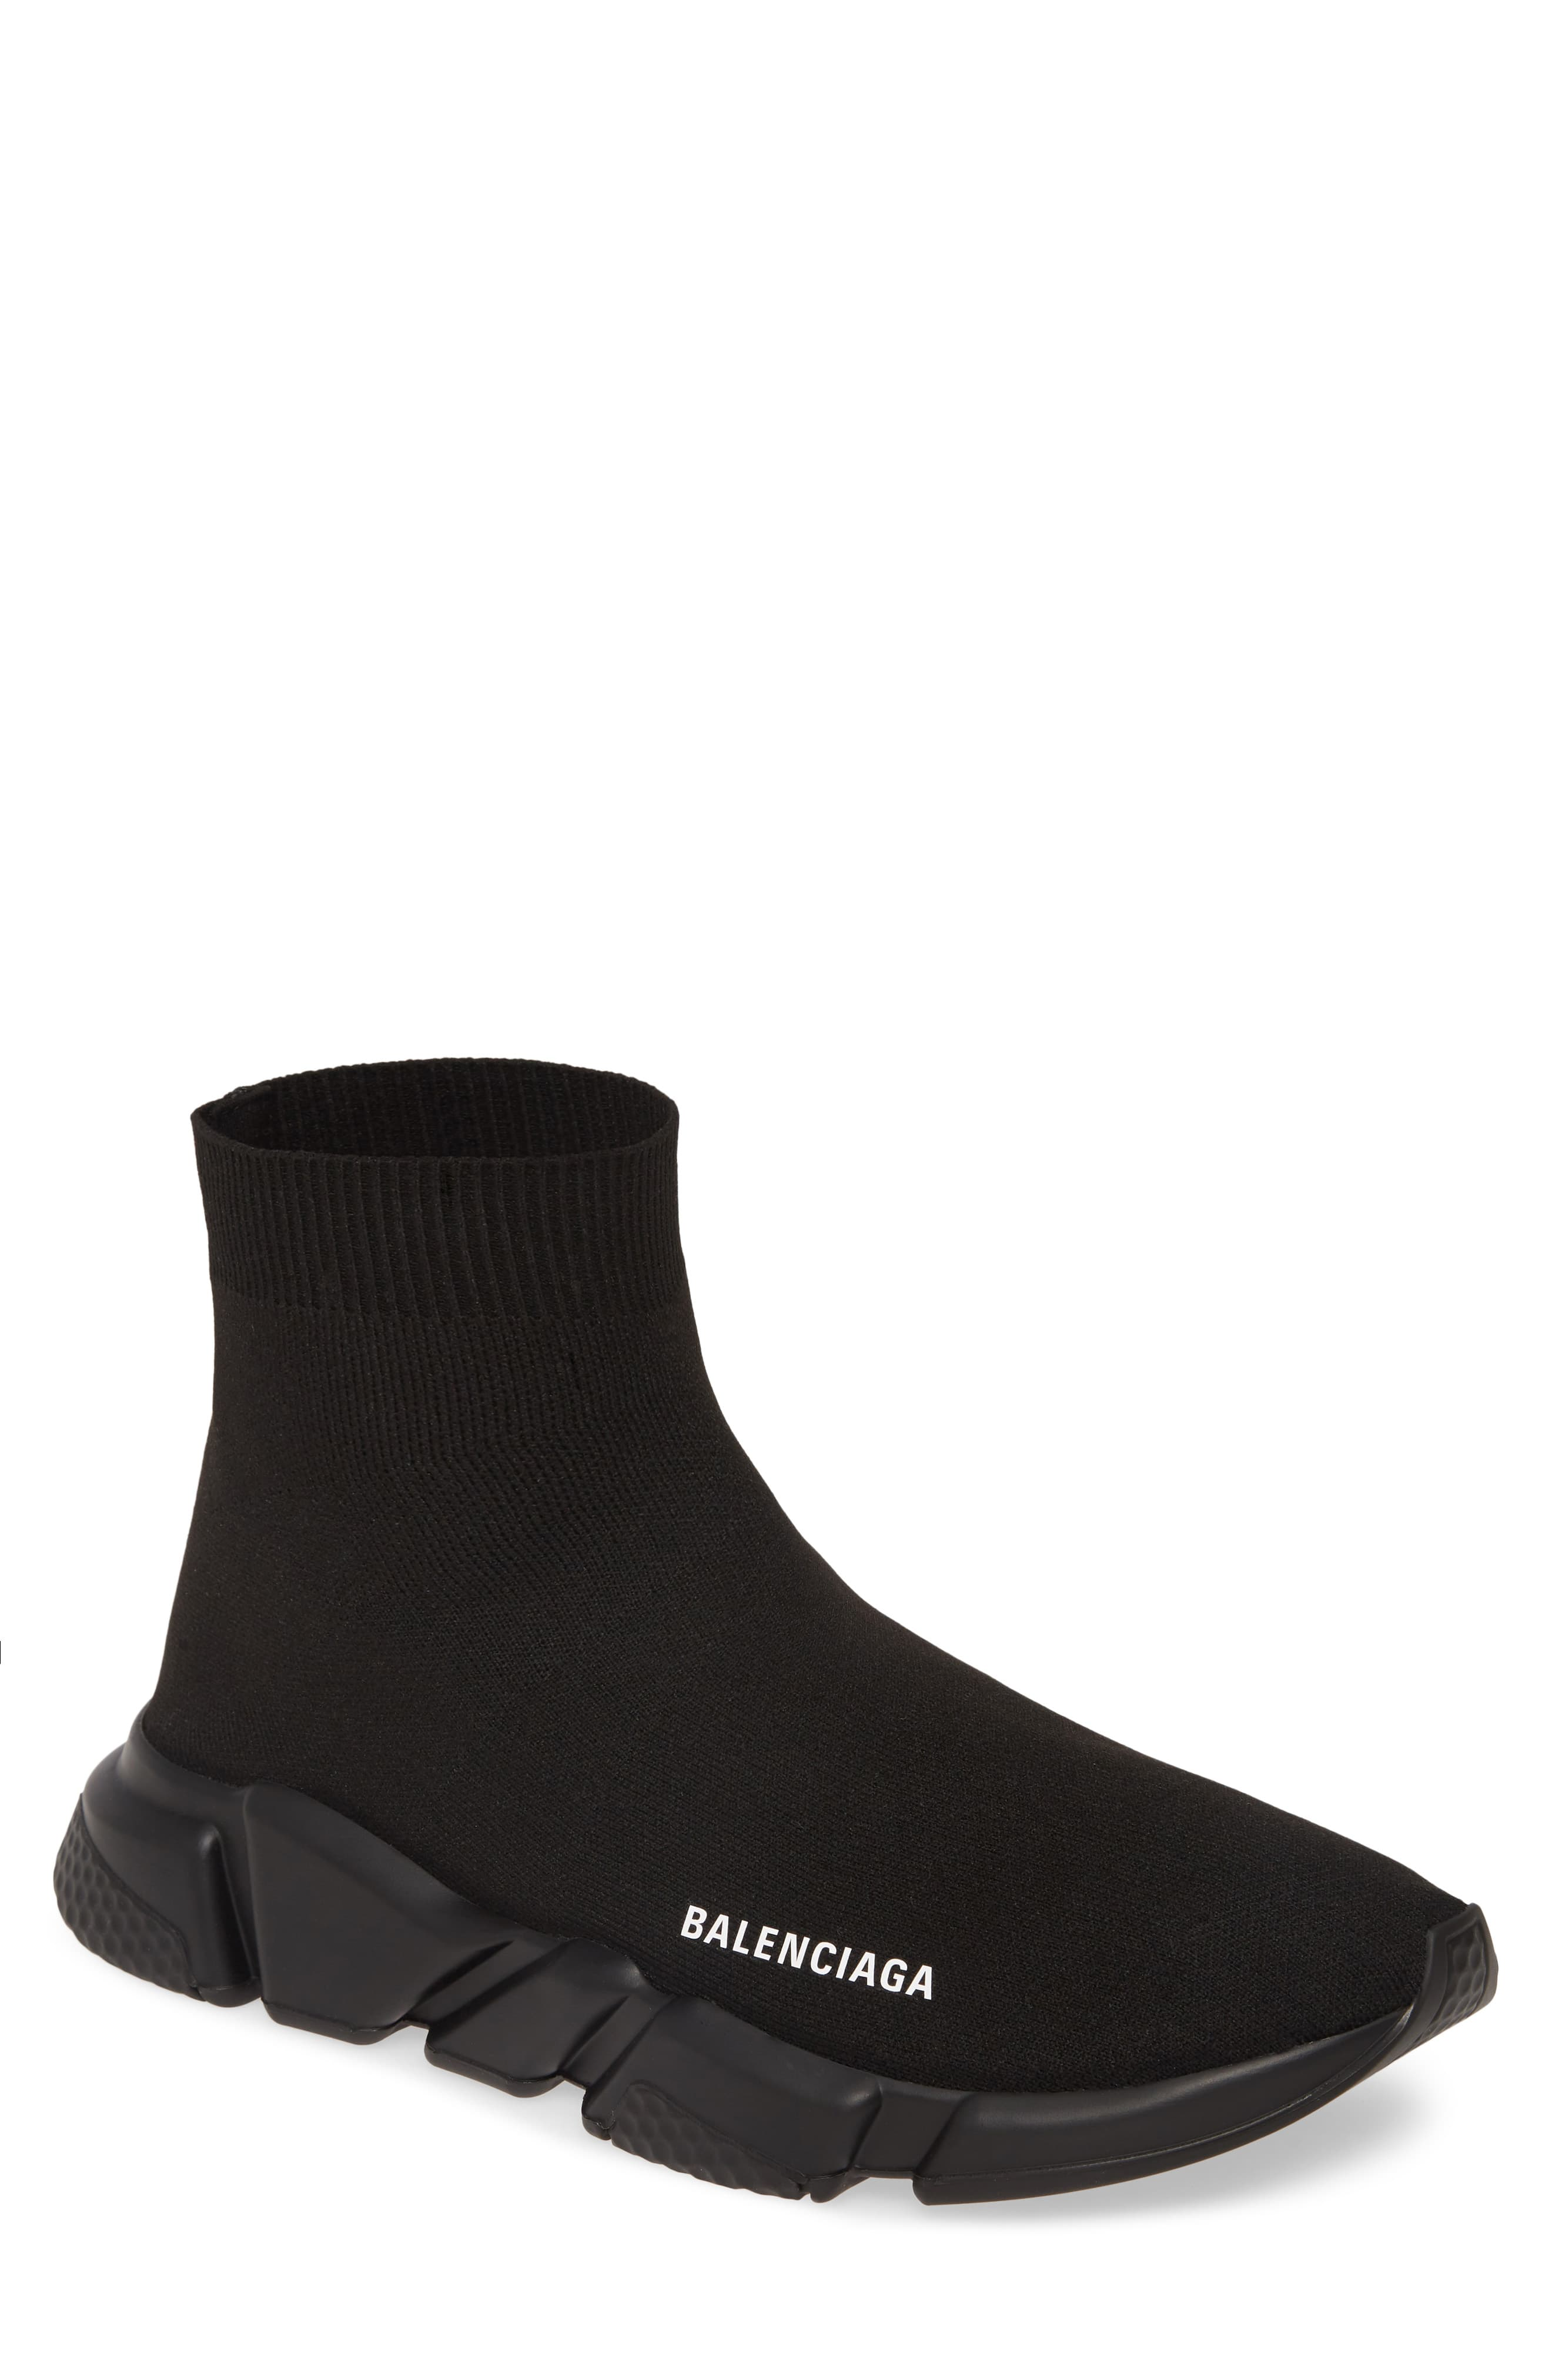 Balenciaga Speed High Slip-On (Men in